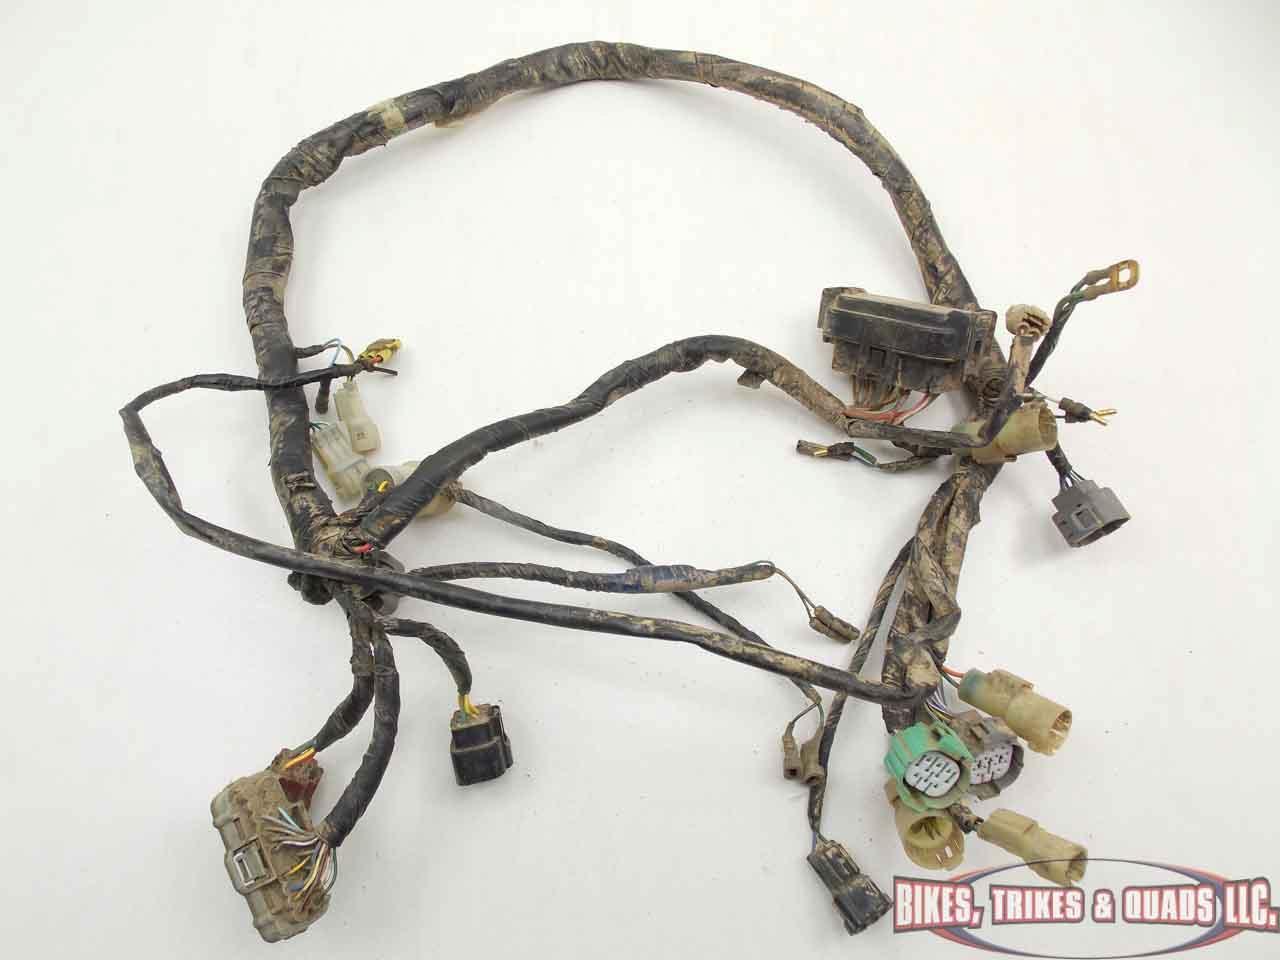 2002 honda 350 rancher 4x4 wiring diagrams 2002 honda